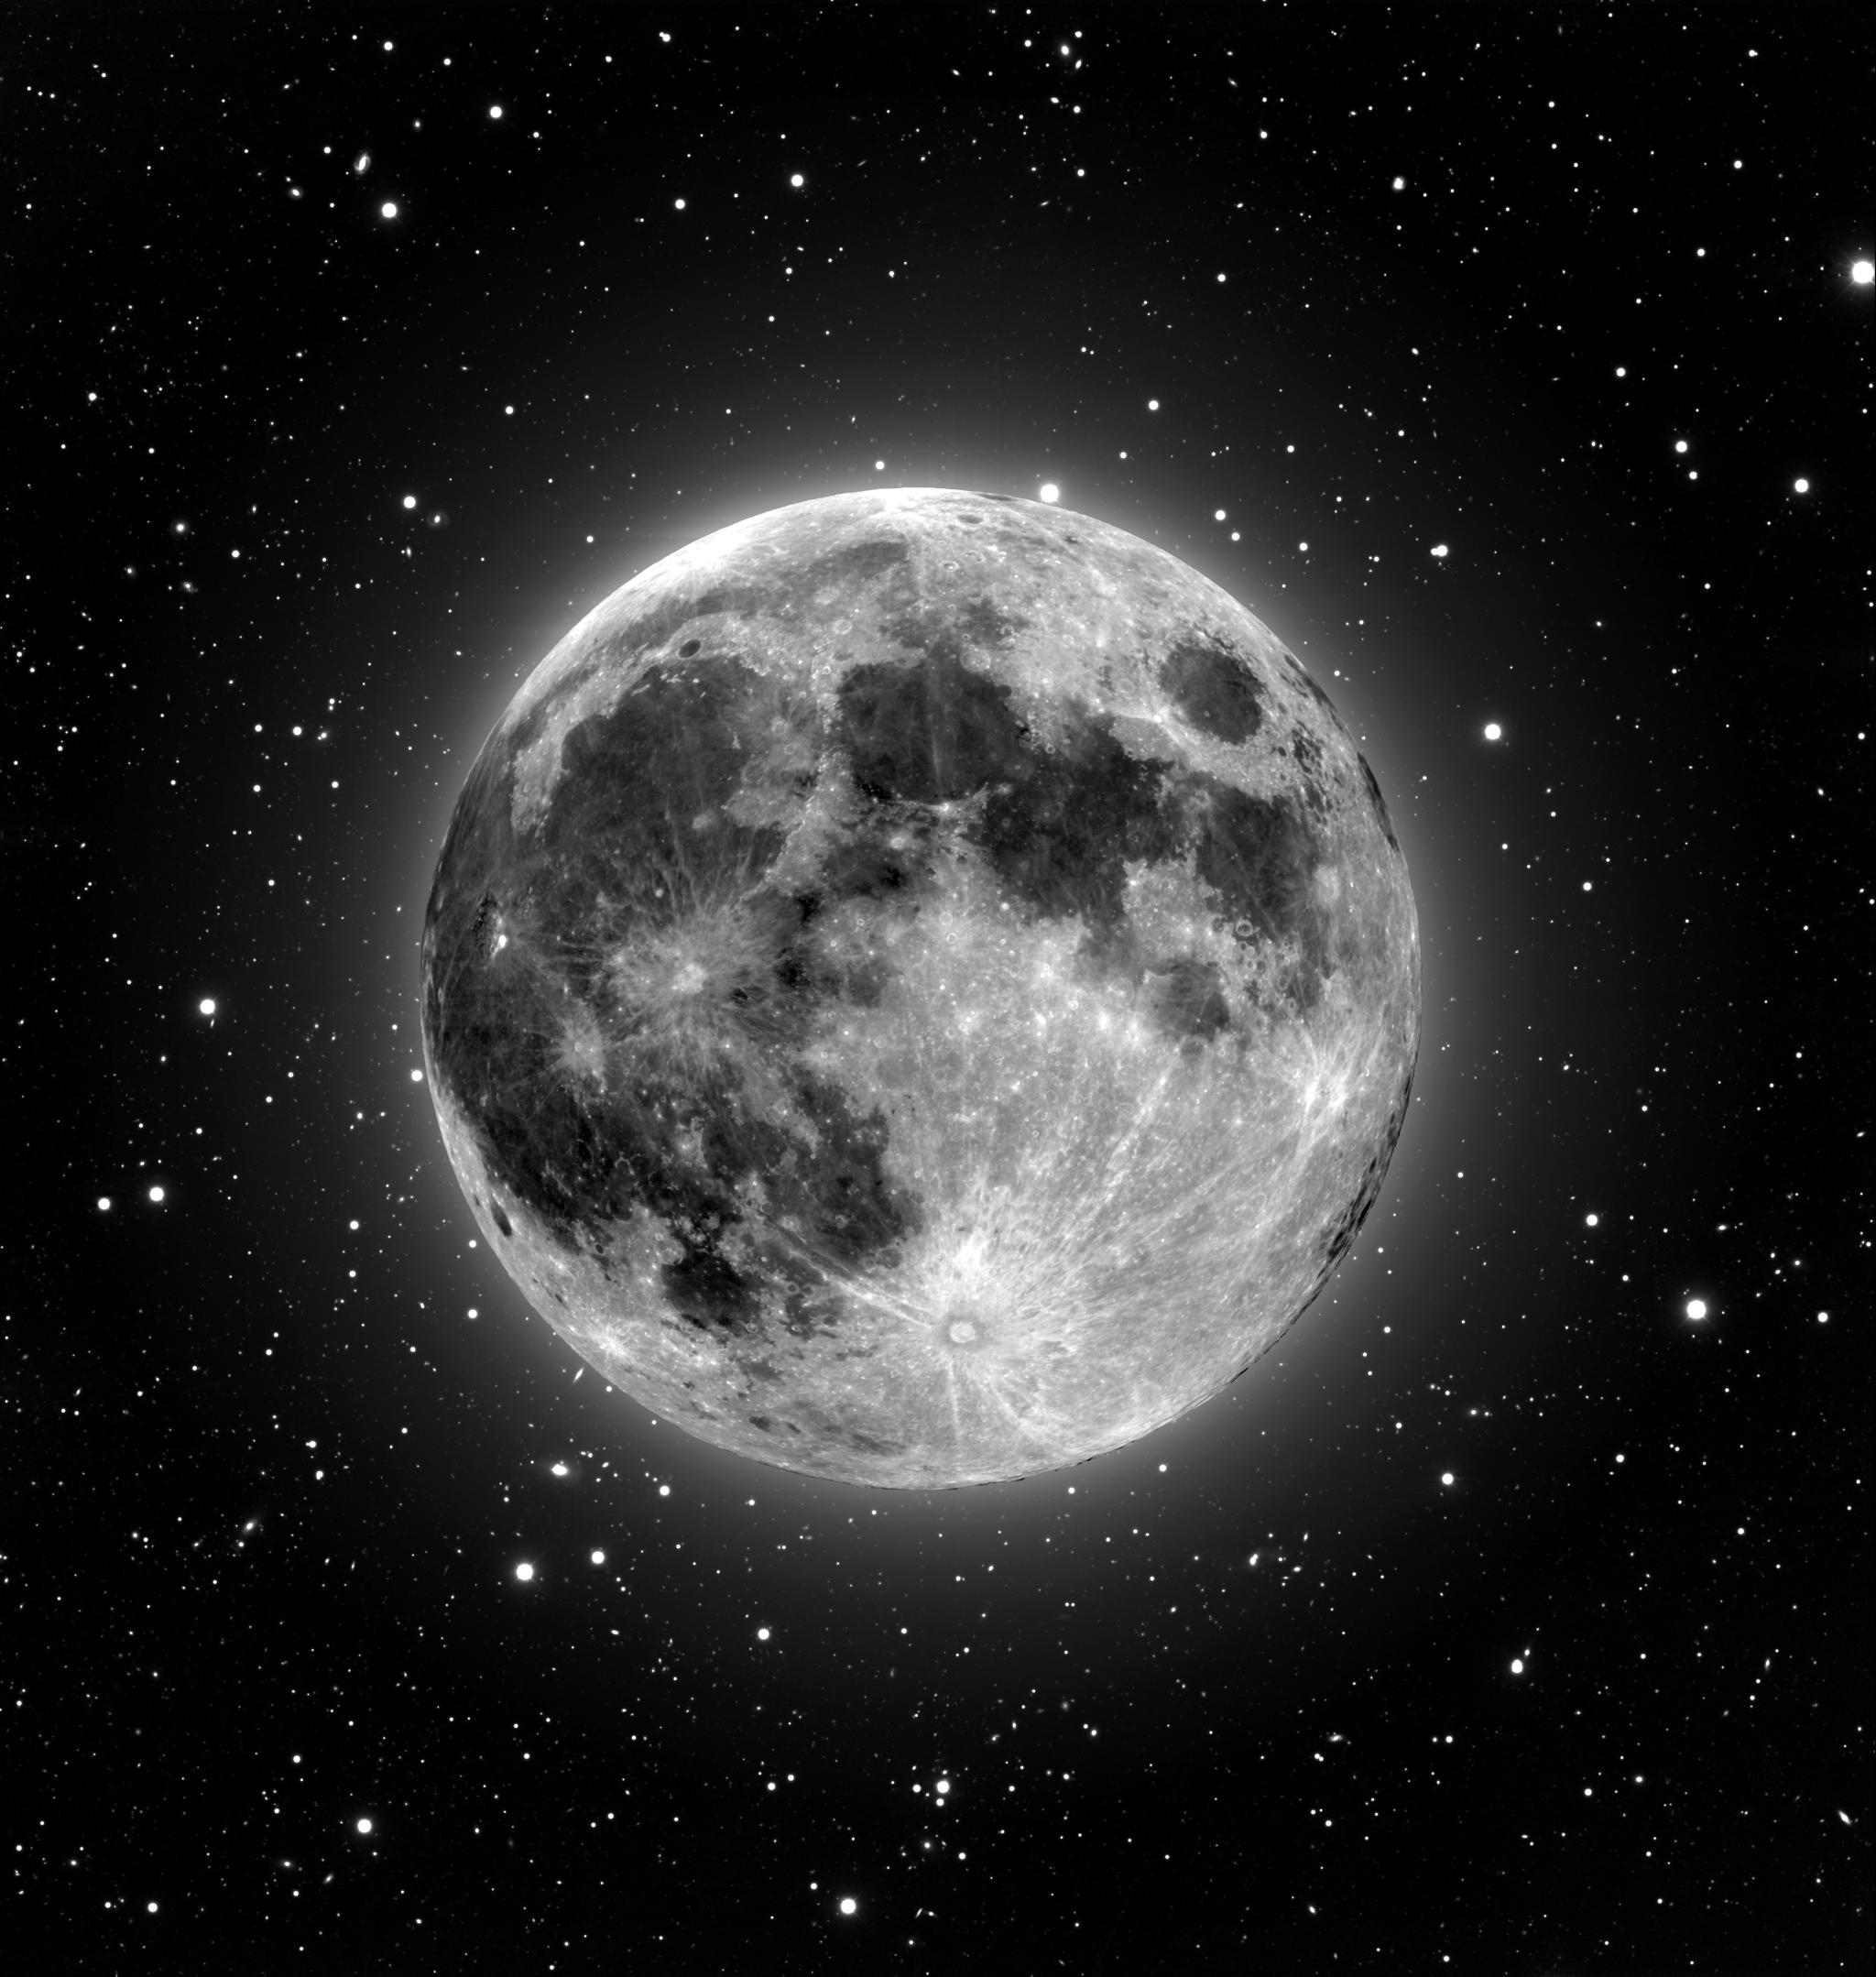 apod 2001 september 6 moon and stars